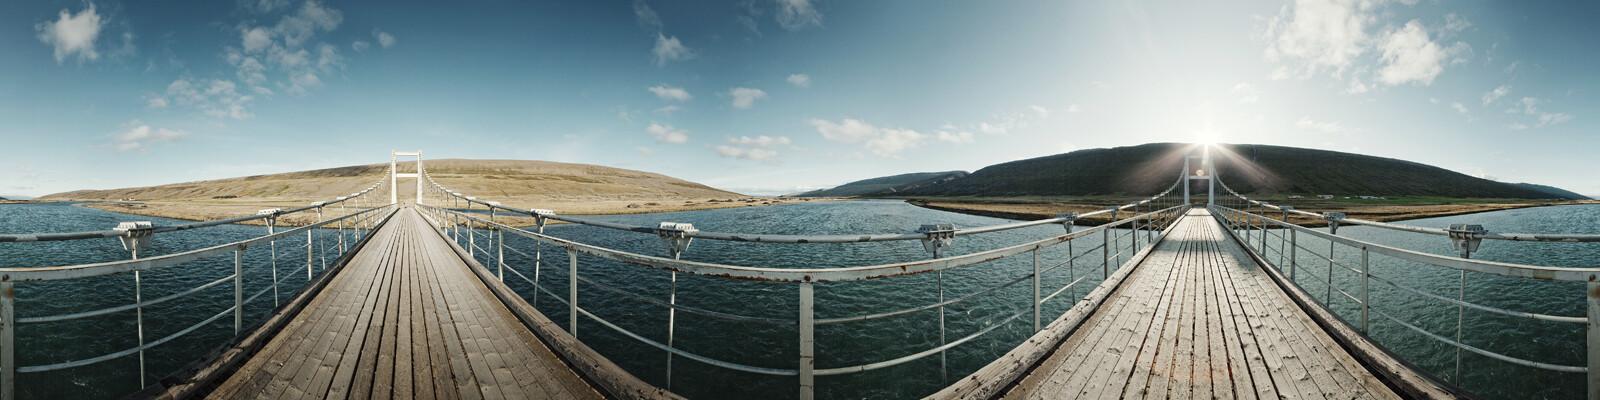 Iceland #1 Skjálfandafljót - Josh Von Staudach